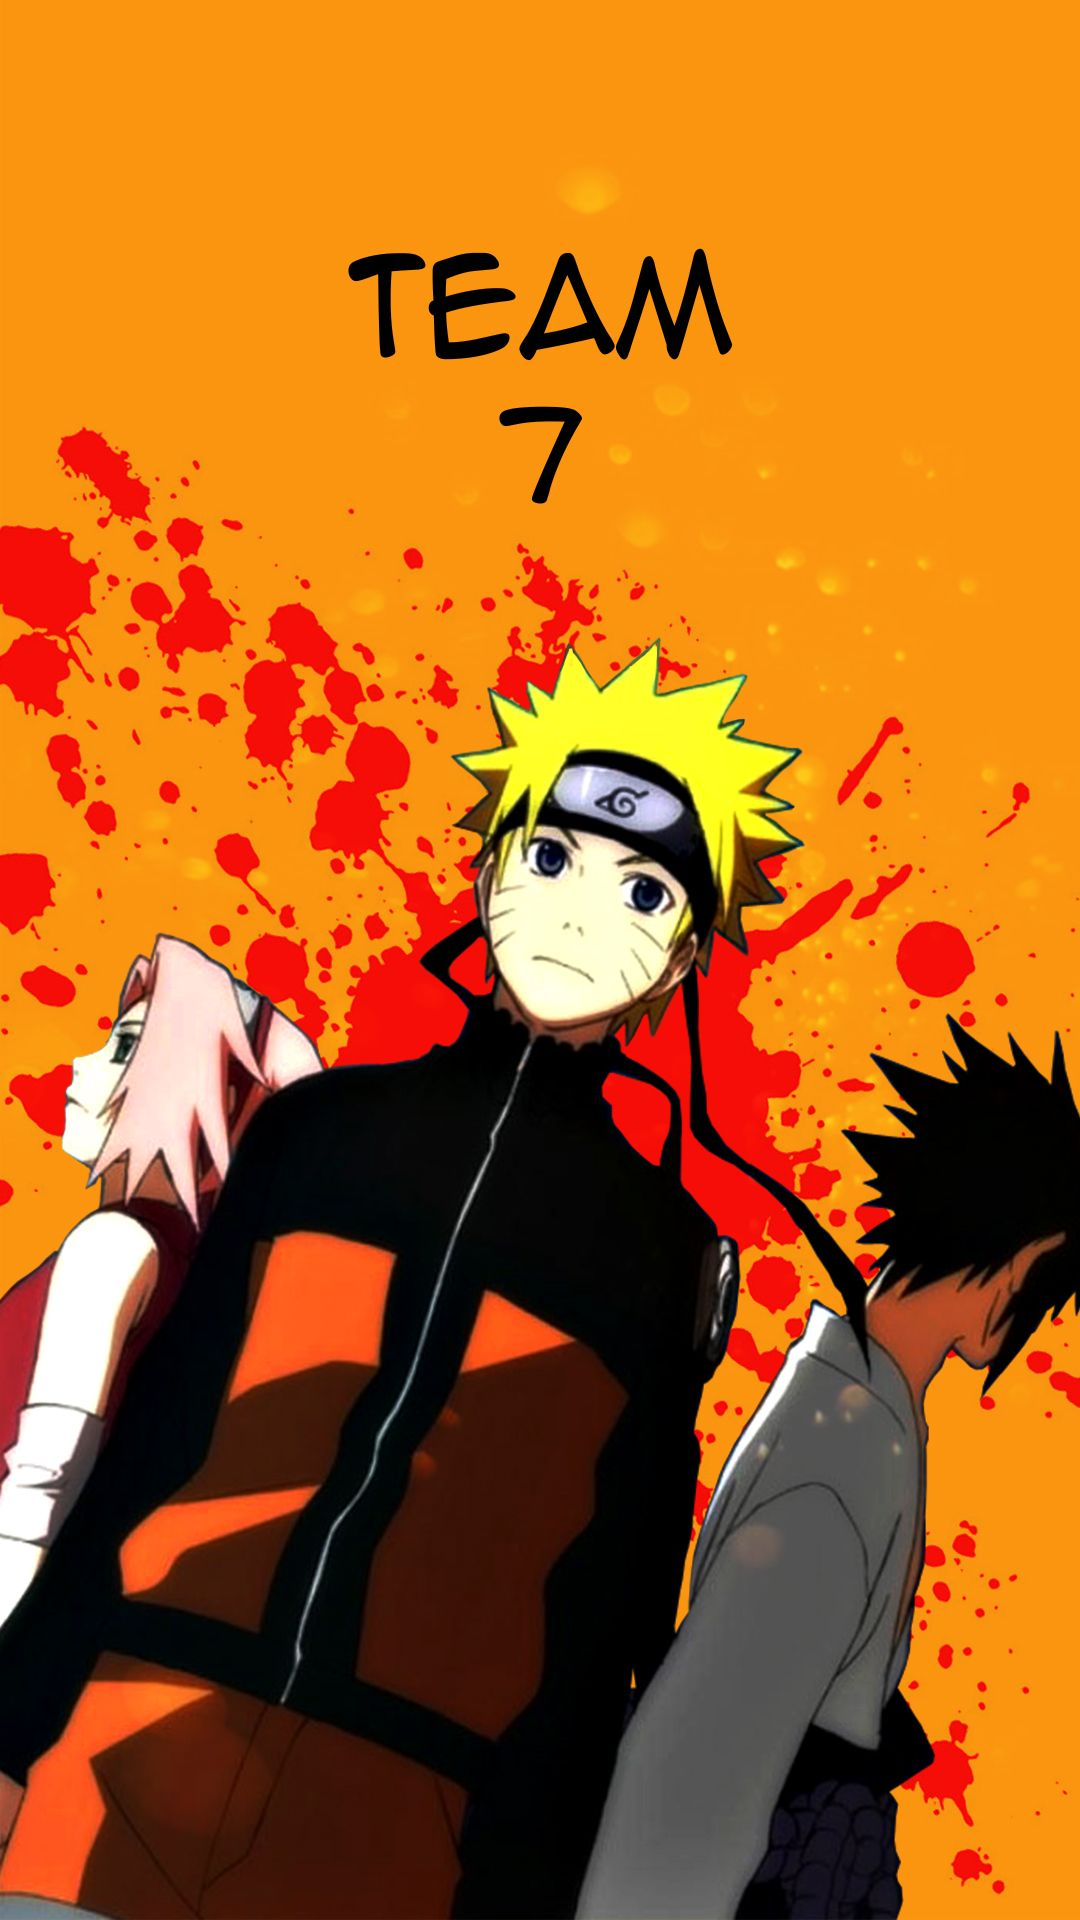 Team 7 Naruto Shippuden Anime Wallpaper Anime Wallpaper